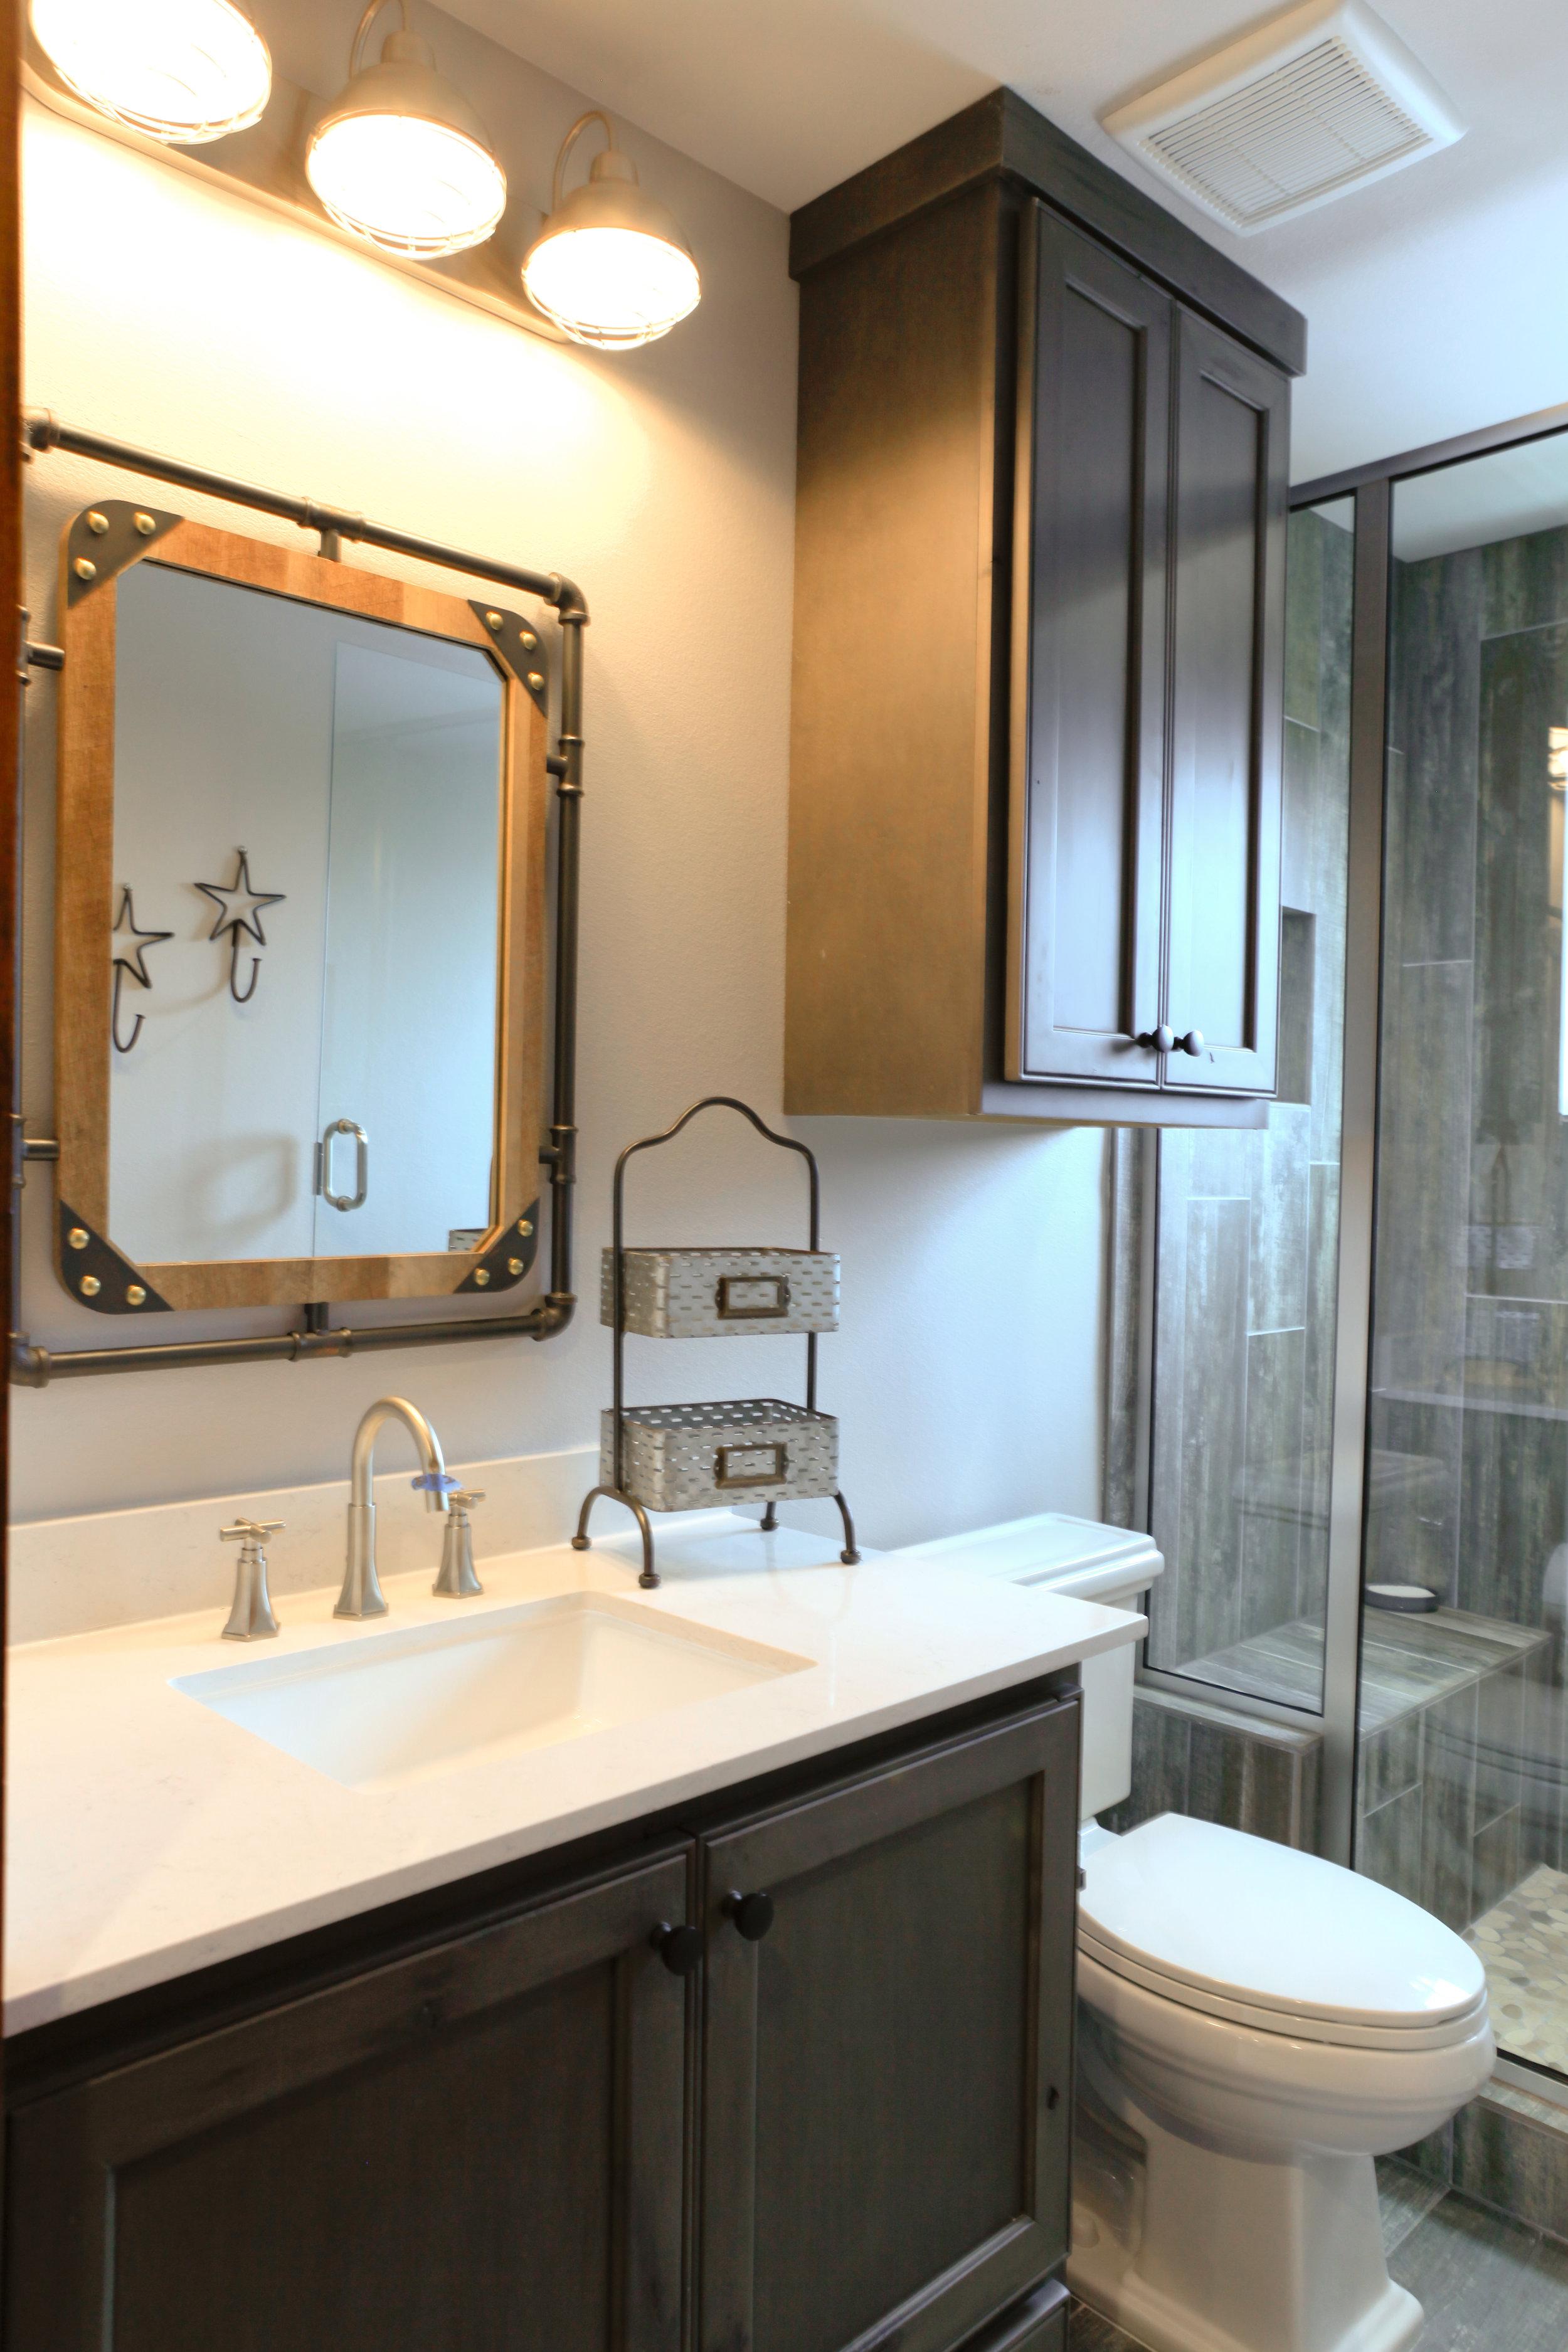 Guest House - Bathroom 1 (2).jpg